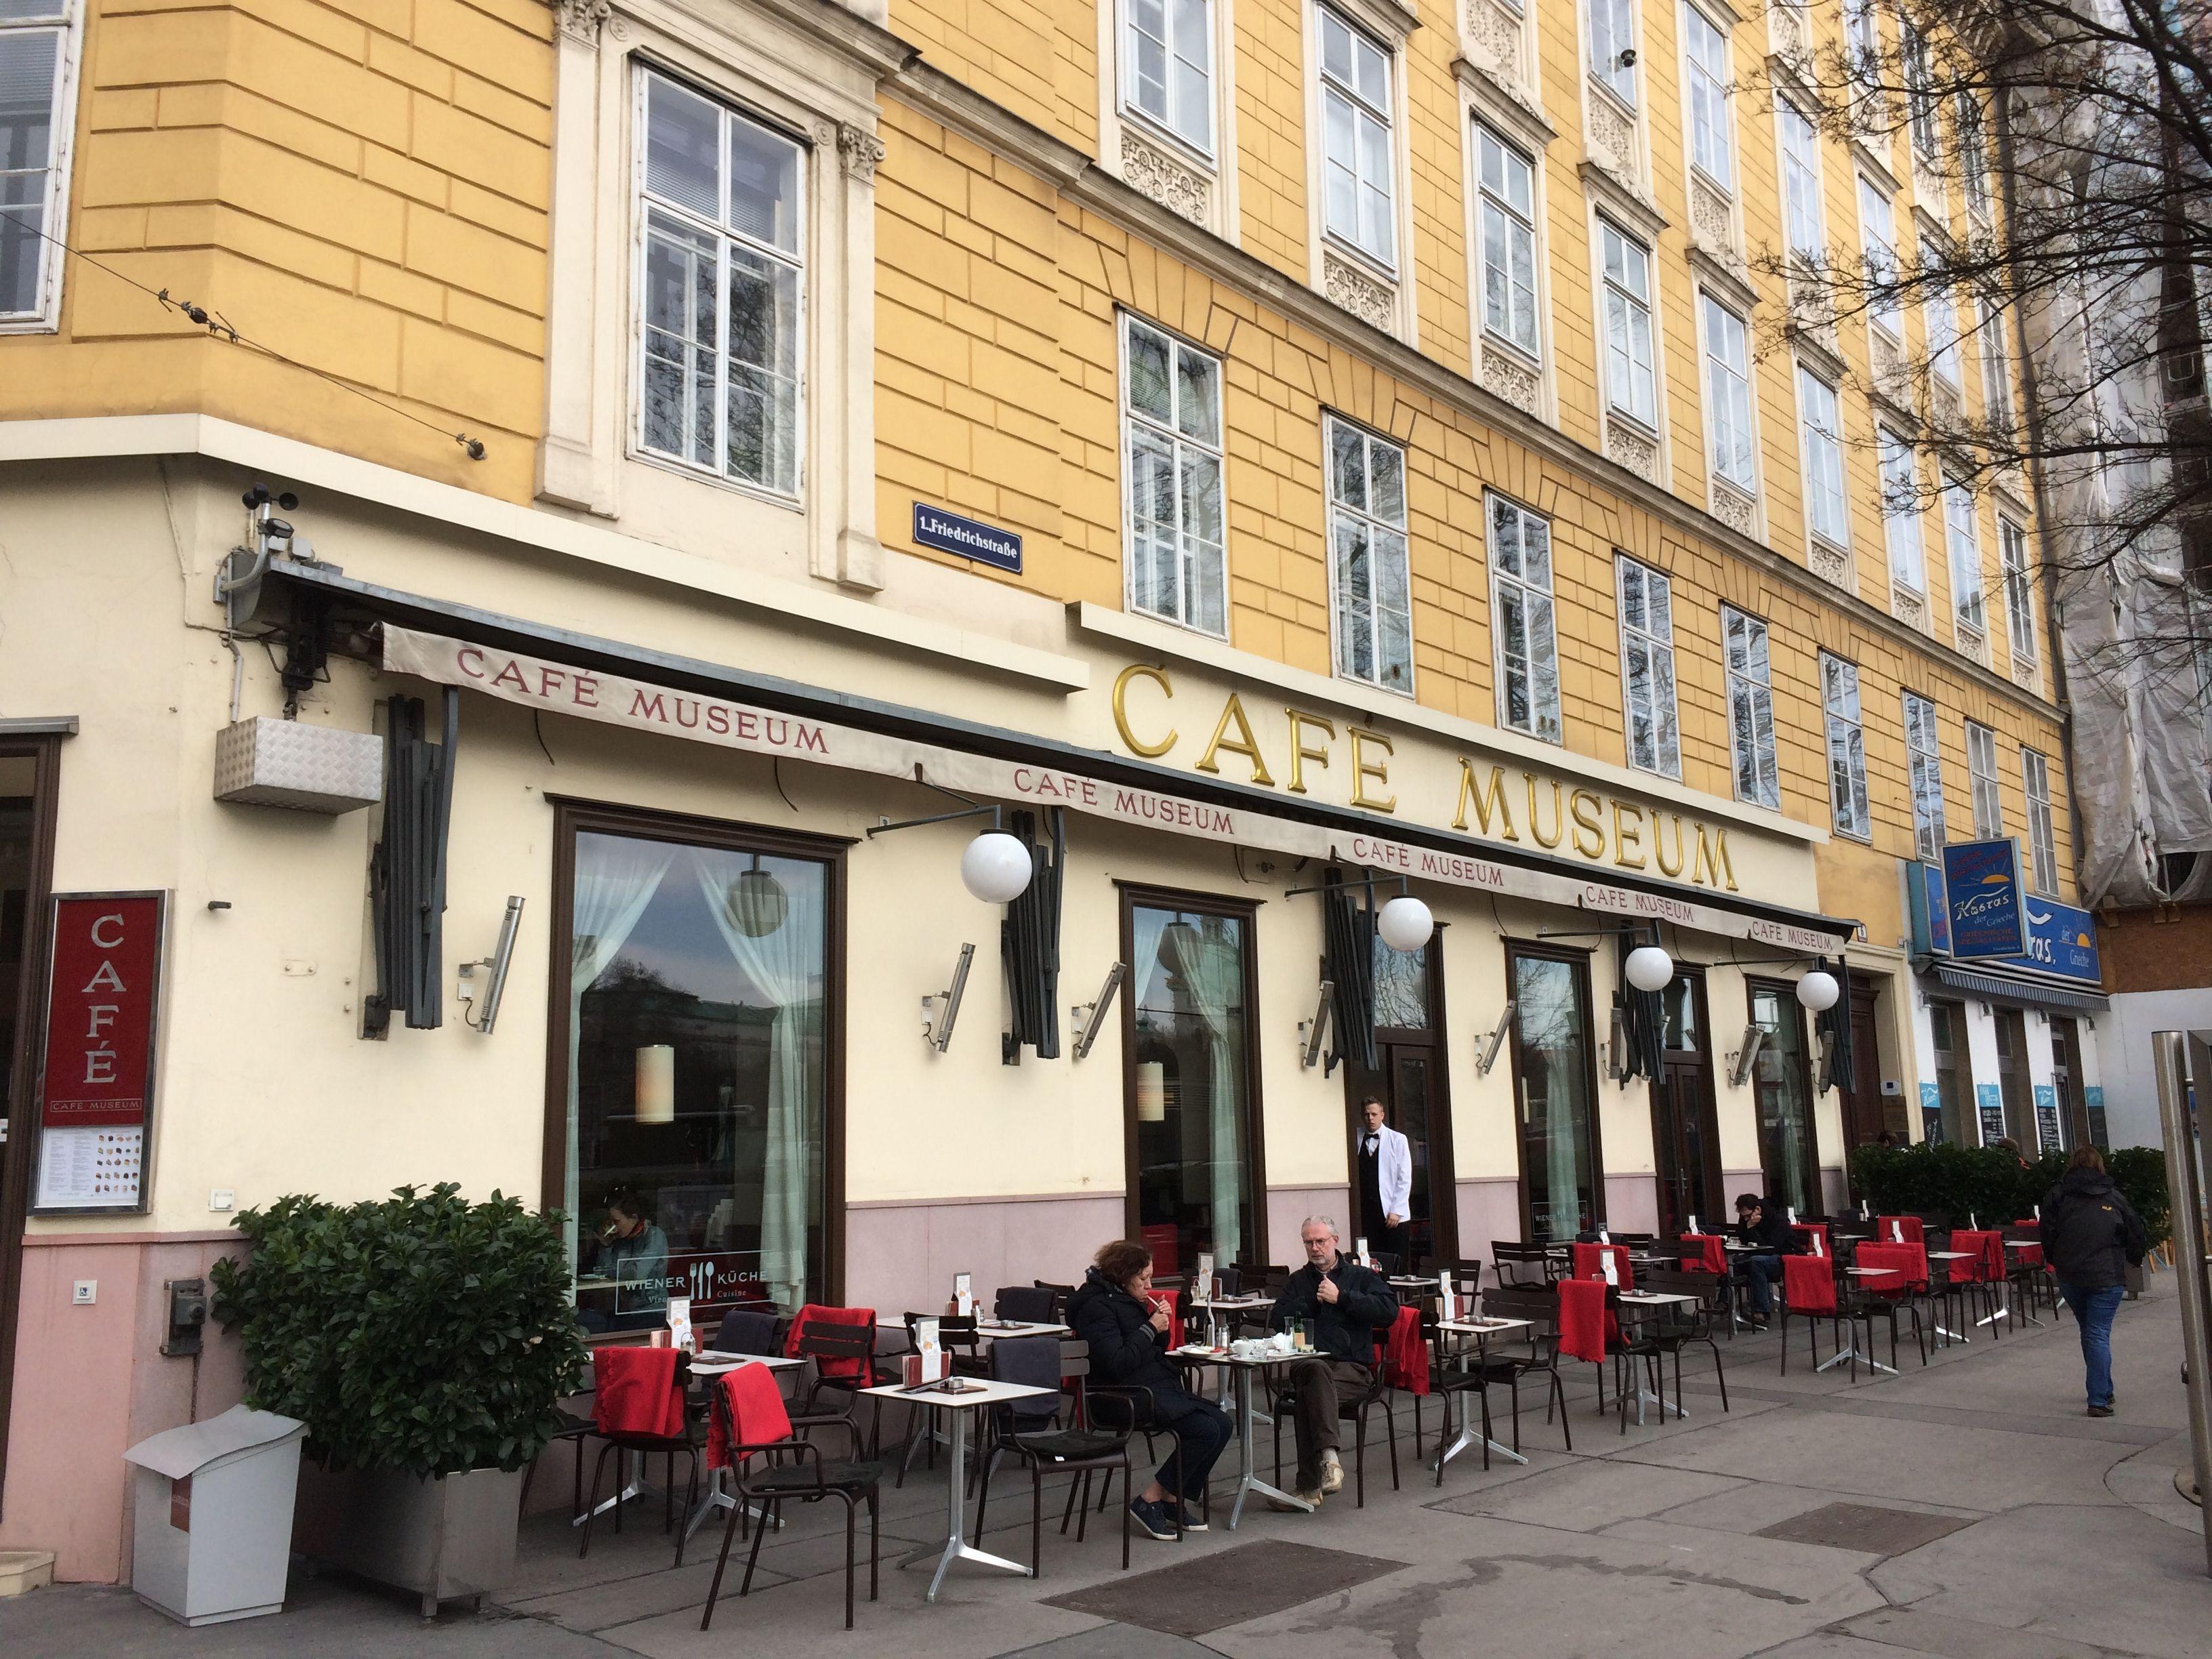 Cafe Museum Wien 1 Bezirk Am Karlsplatz Foto Moka Consorten Street View Views Cafe